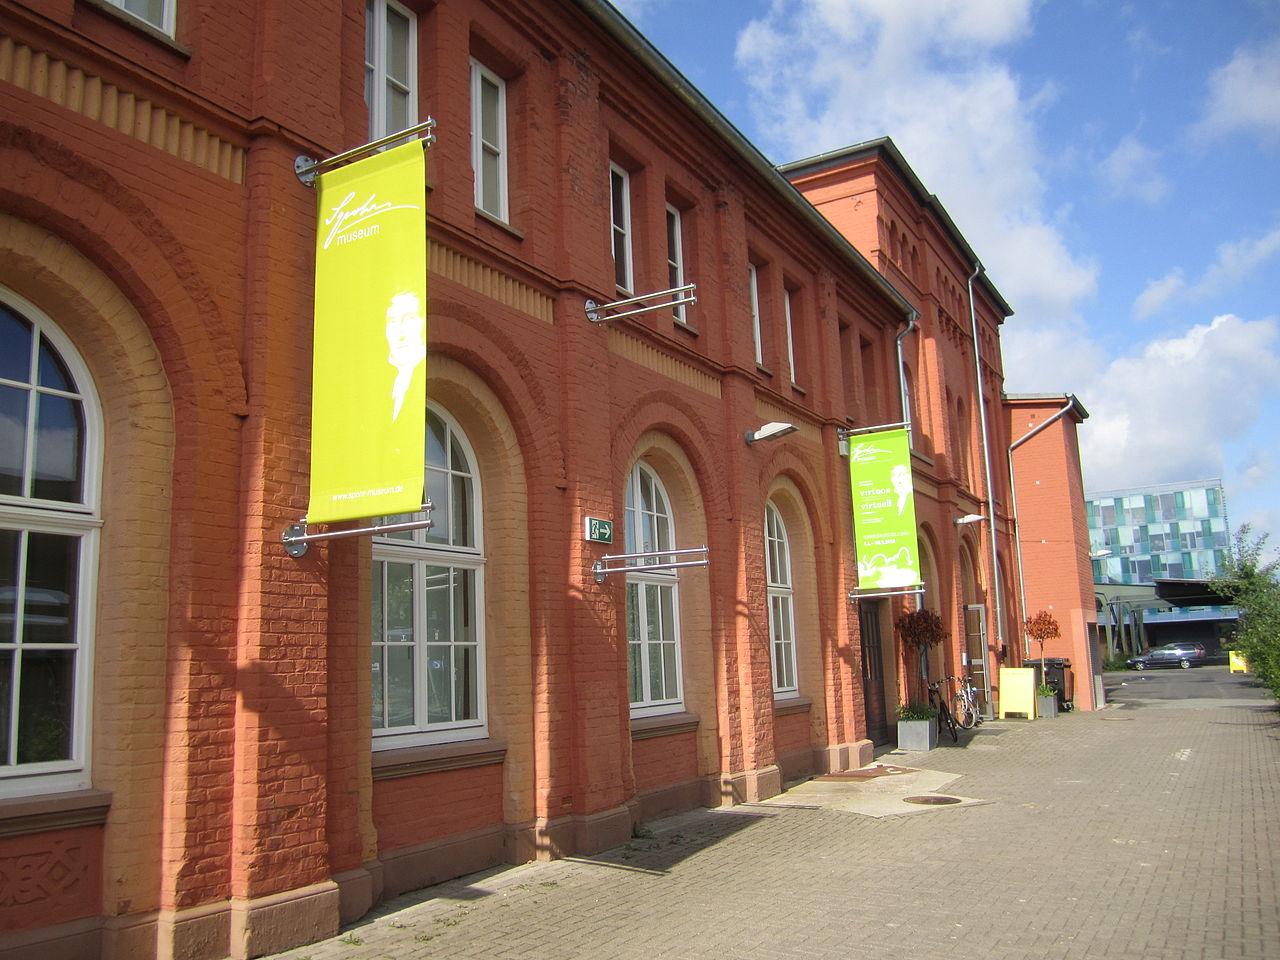 Bild Spohr Museum Kassel